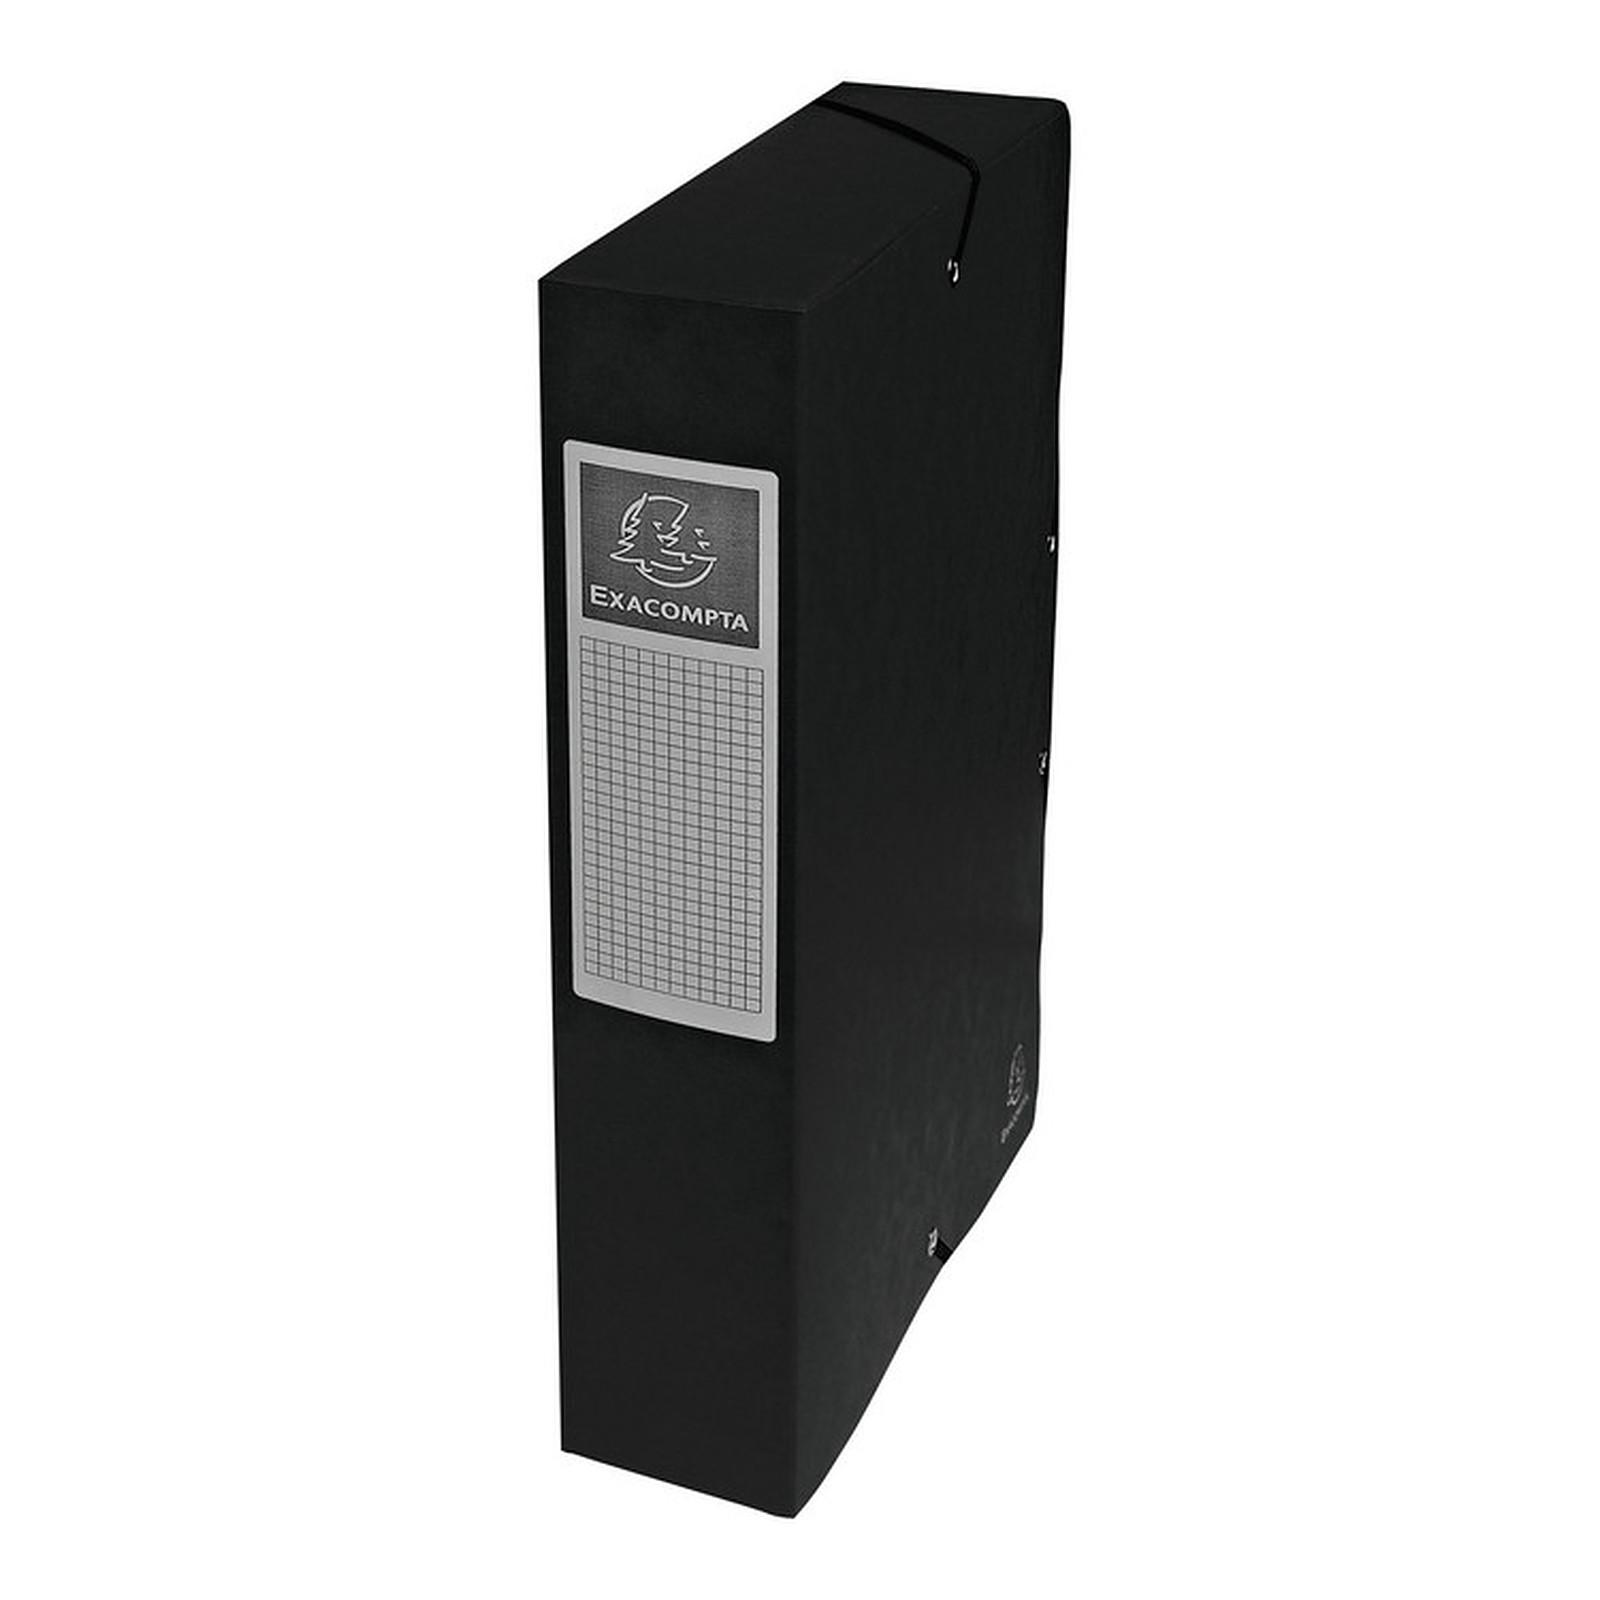 Exacompta Exabox cajas de archivo 60 mm Negro x 8